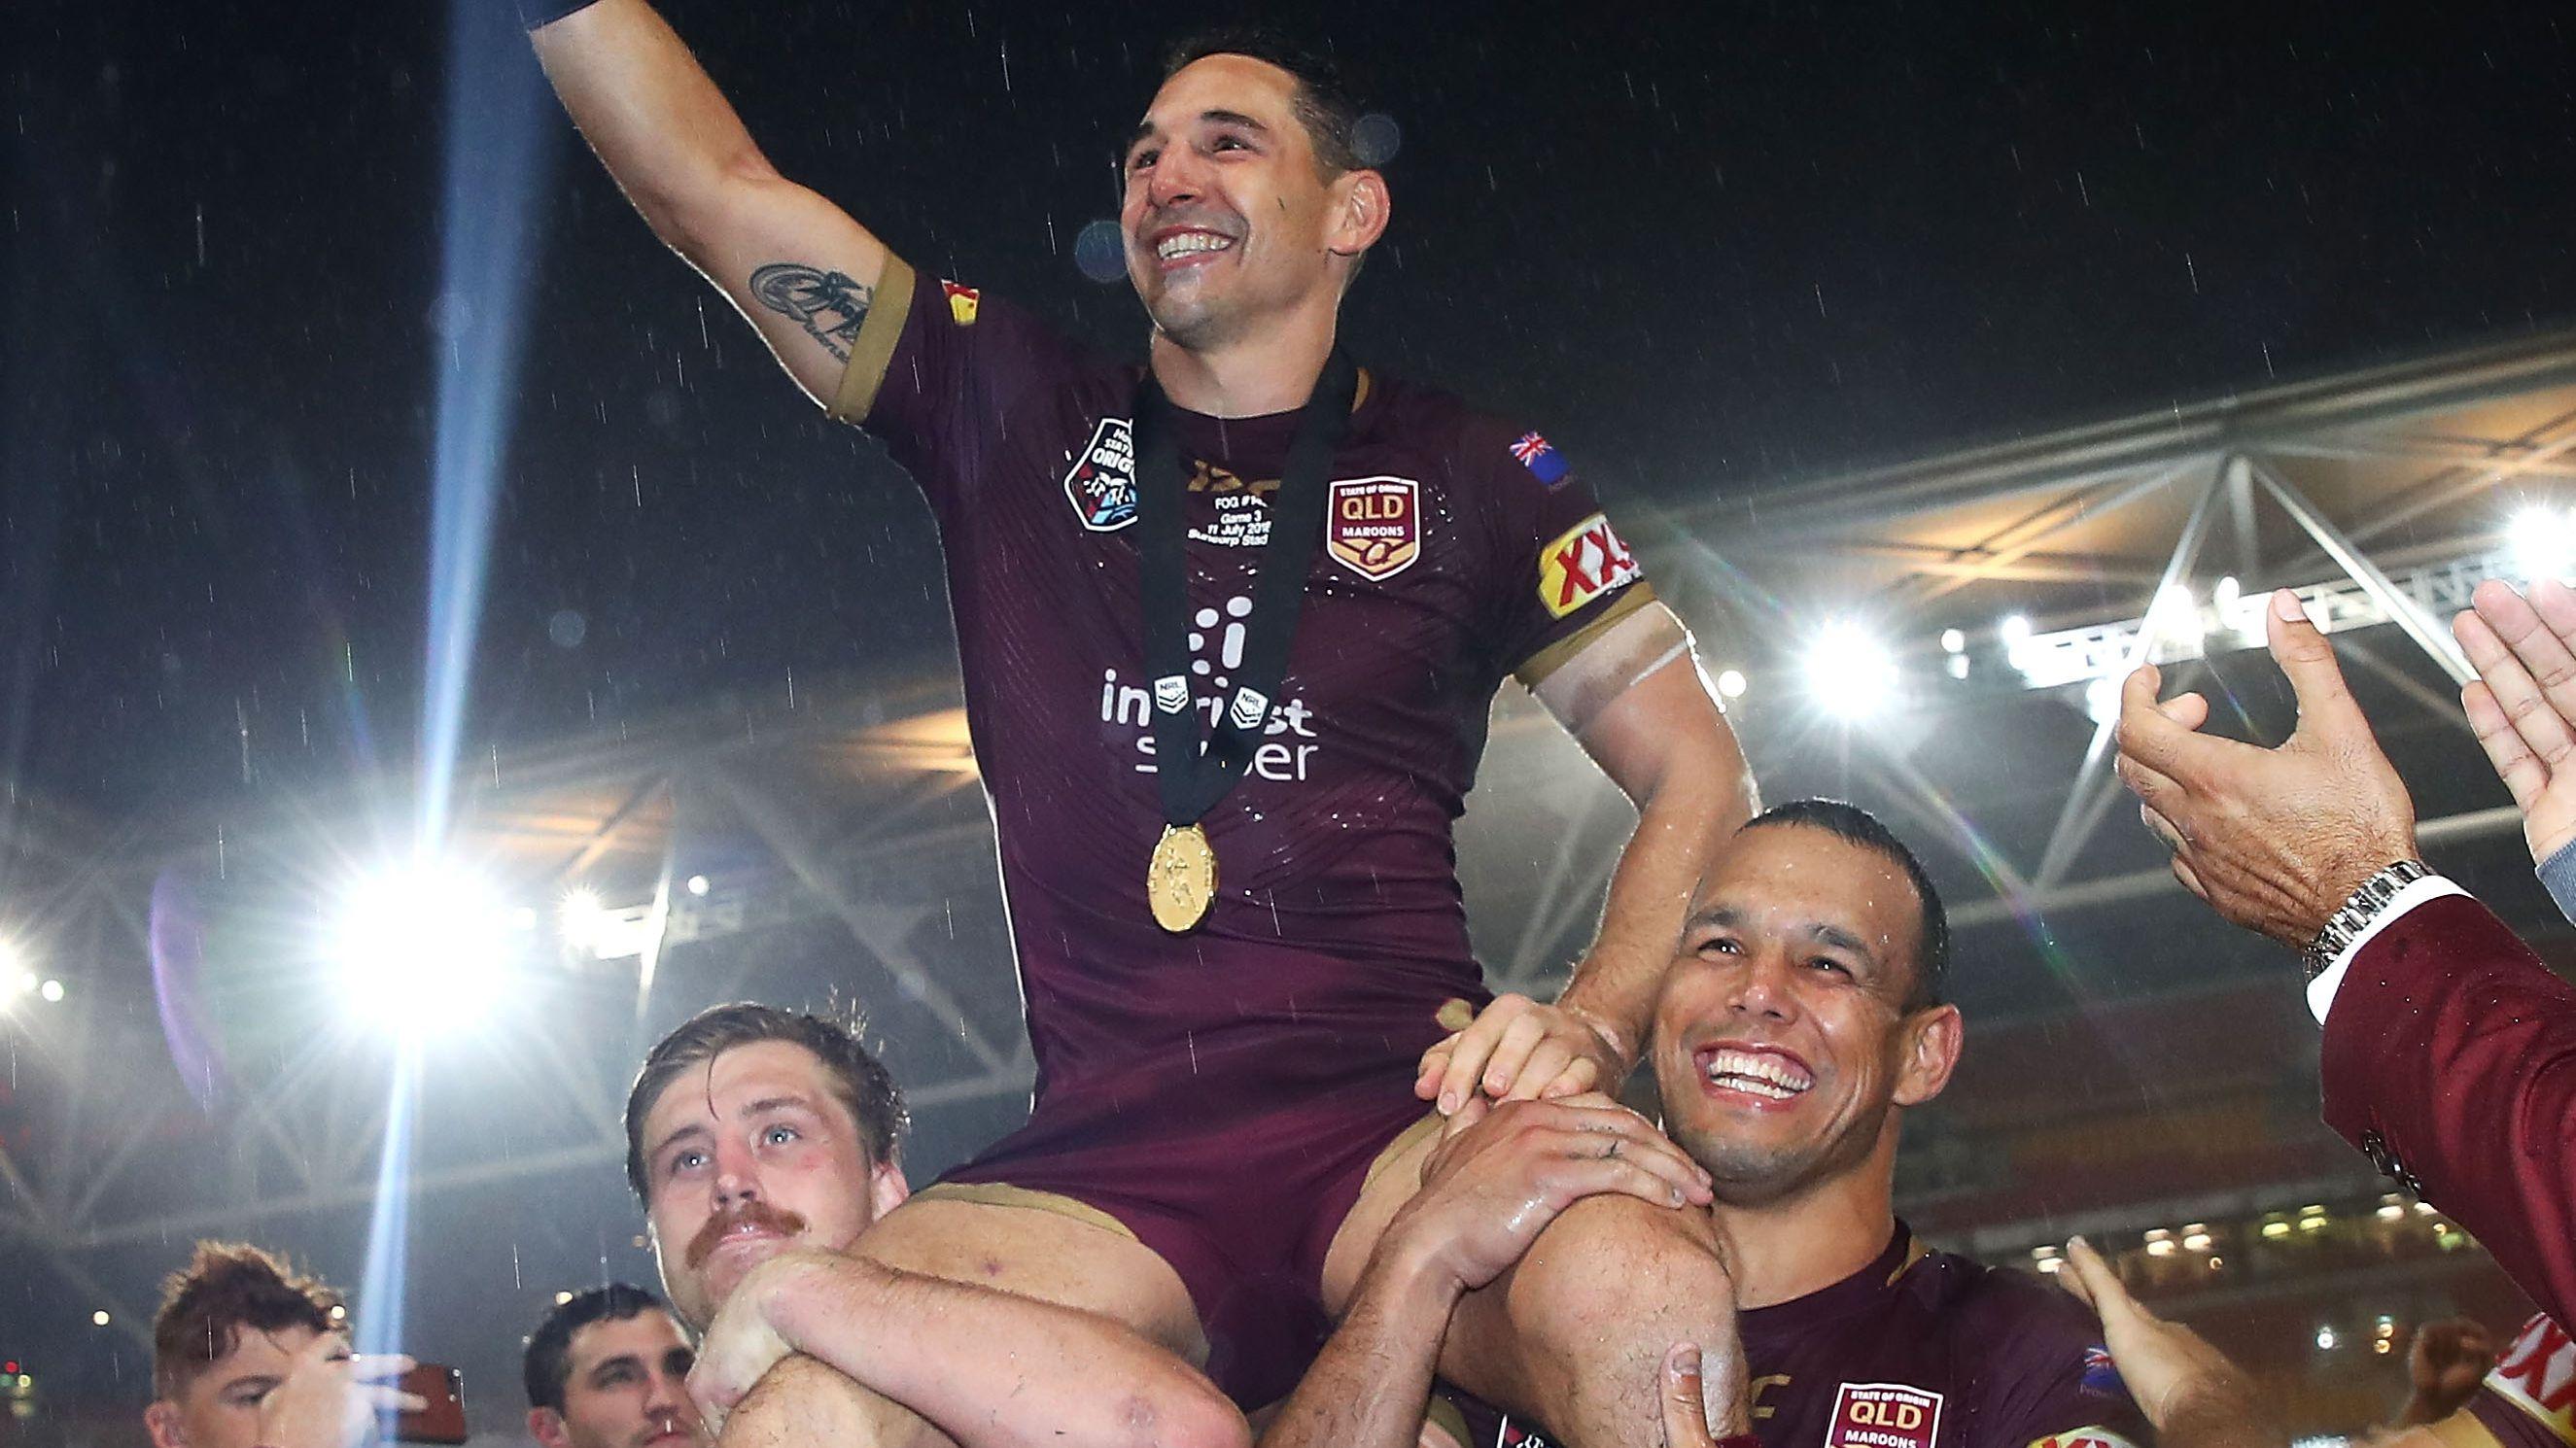 State of Origin legend Billy Slater named new Queensland Maroons coach